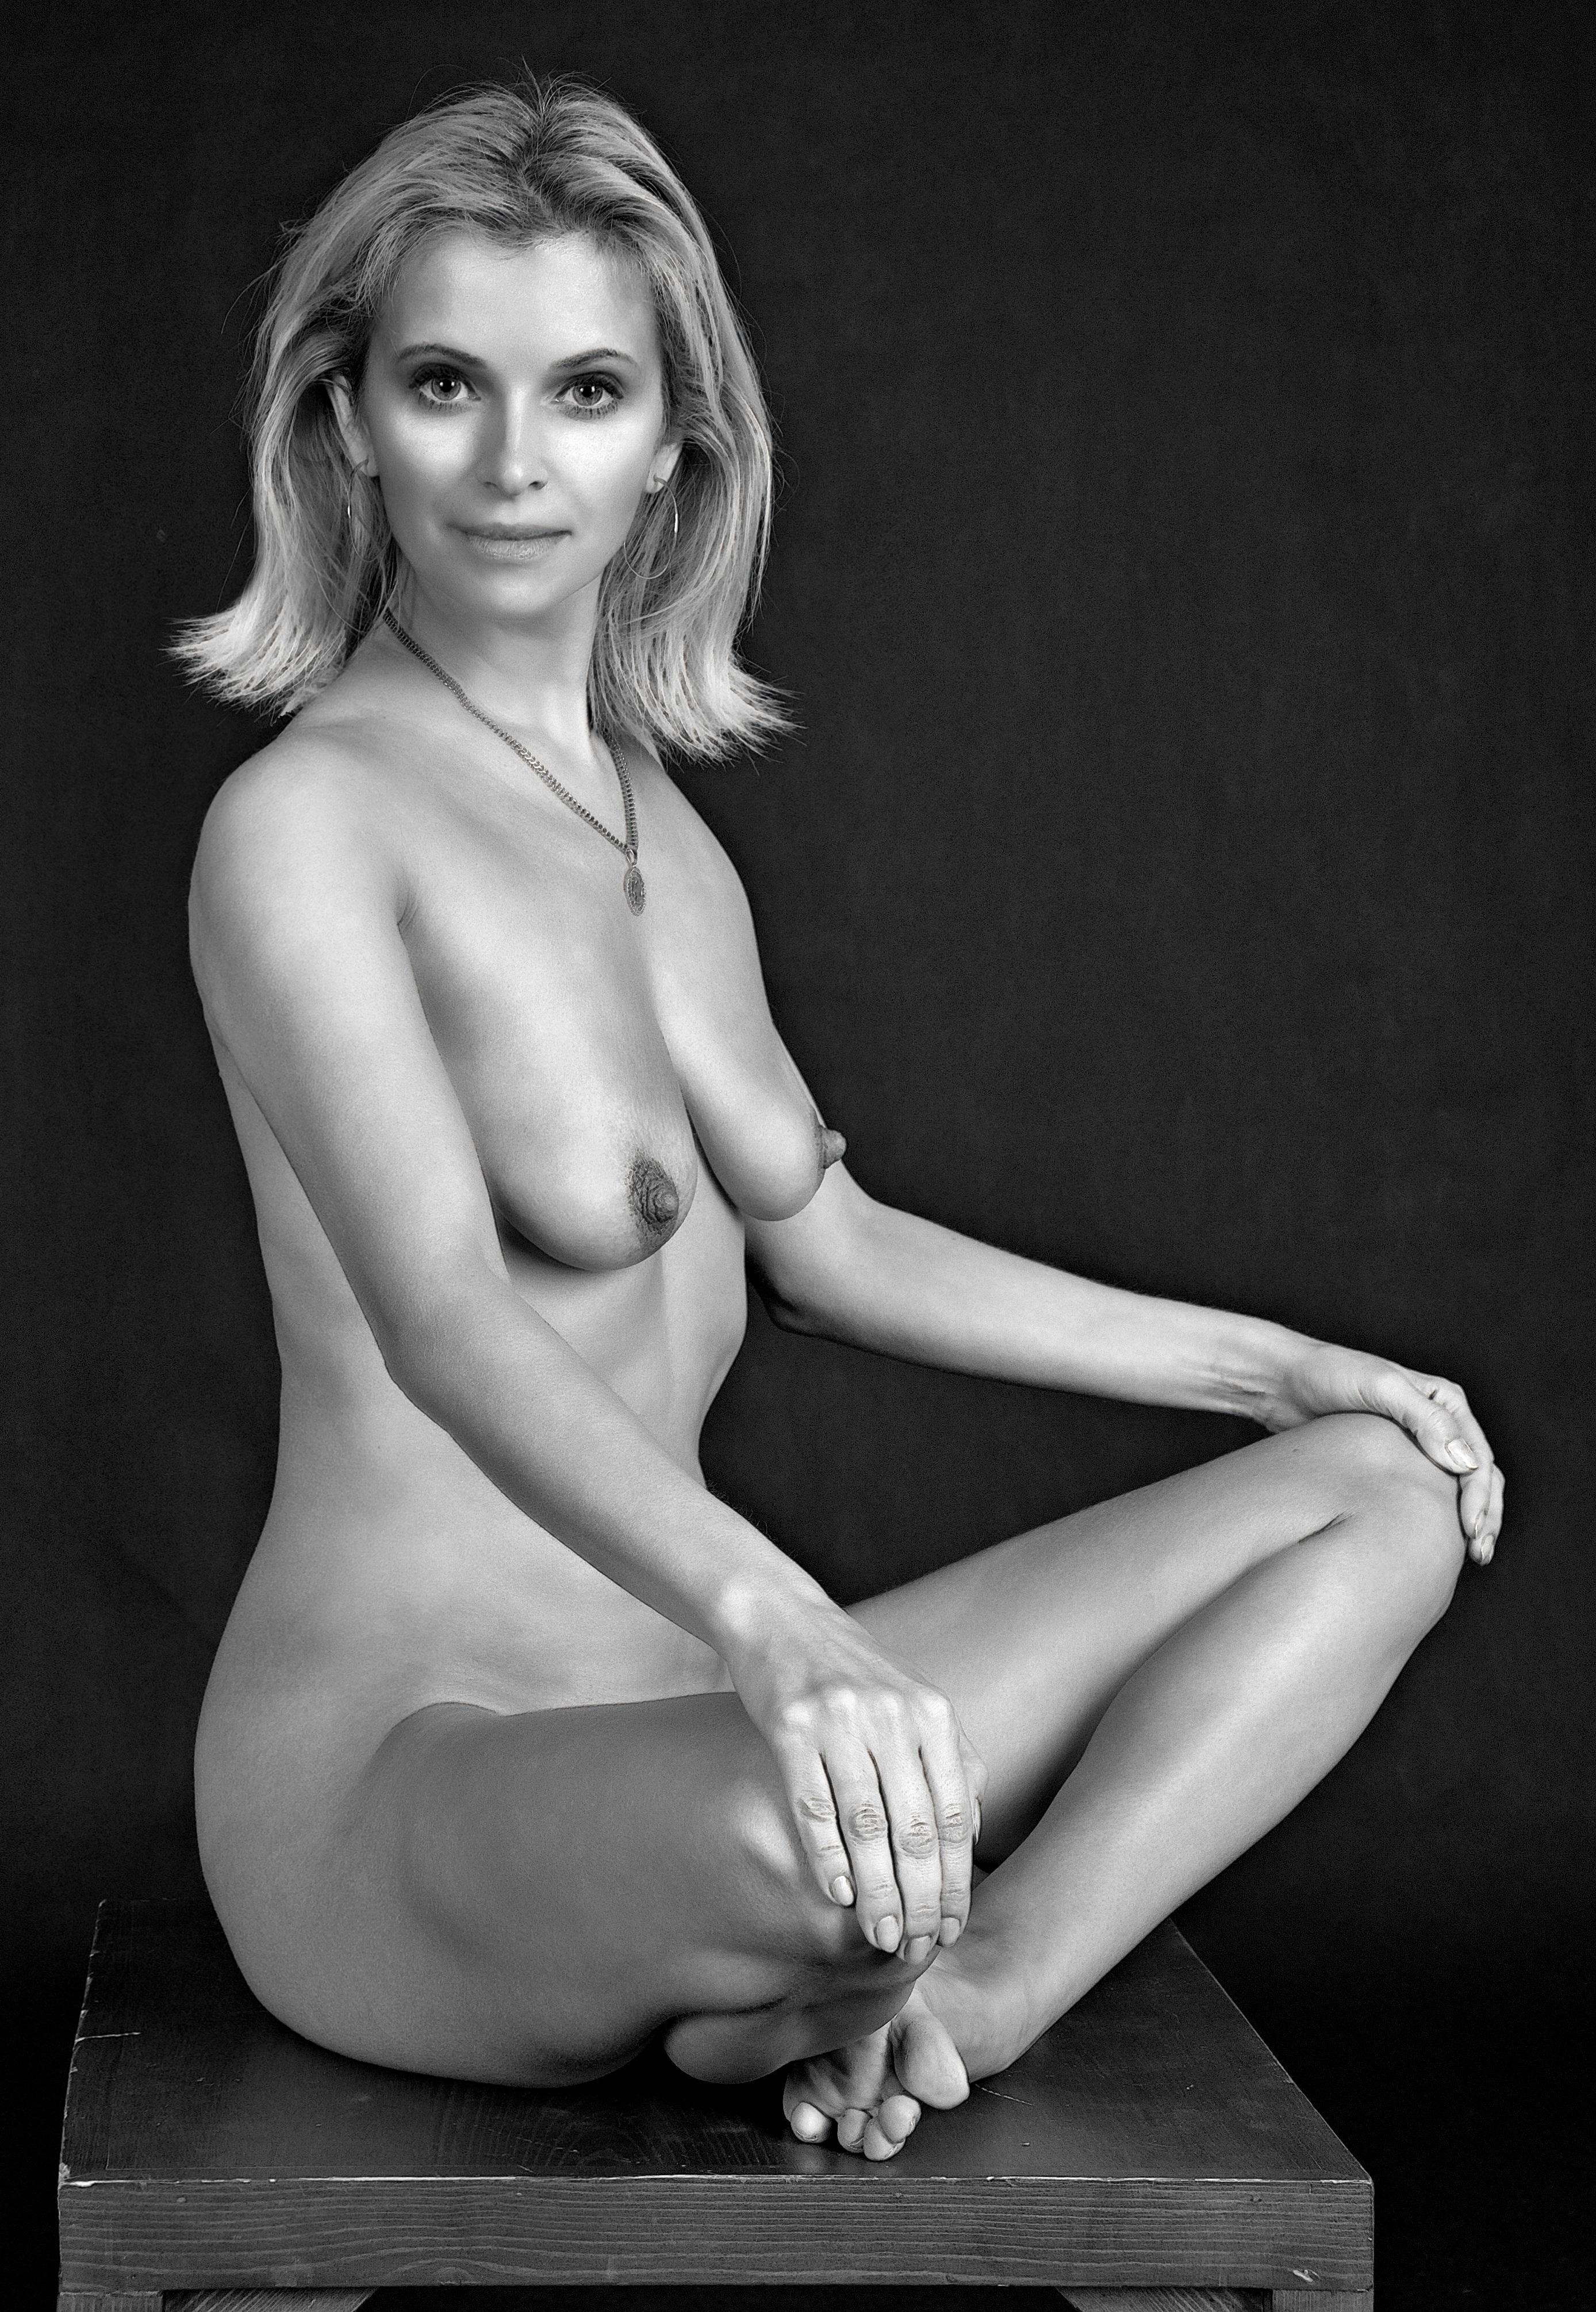 Dig tits blonde mature